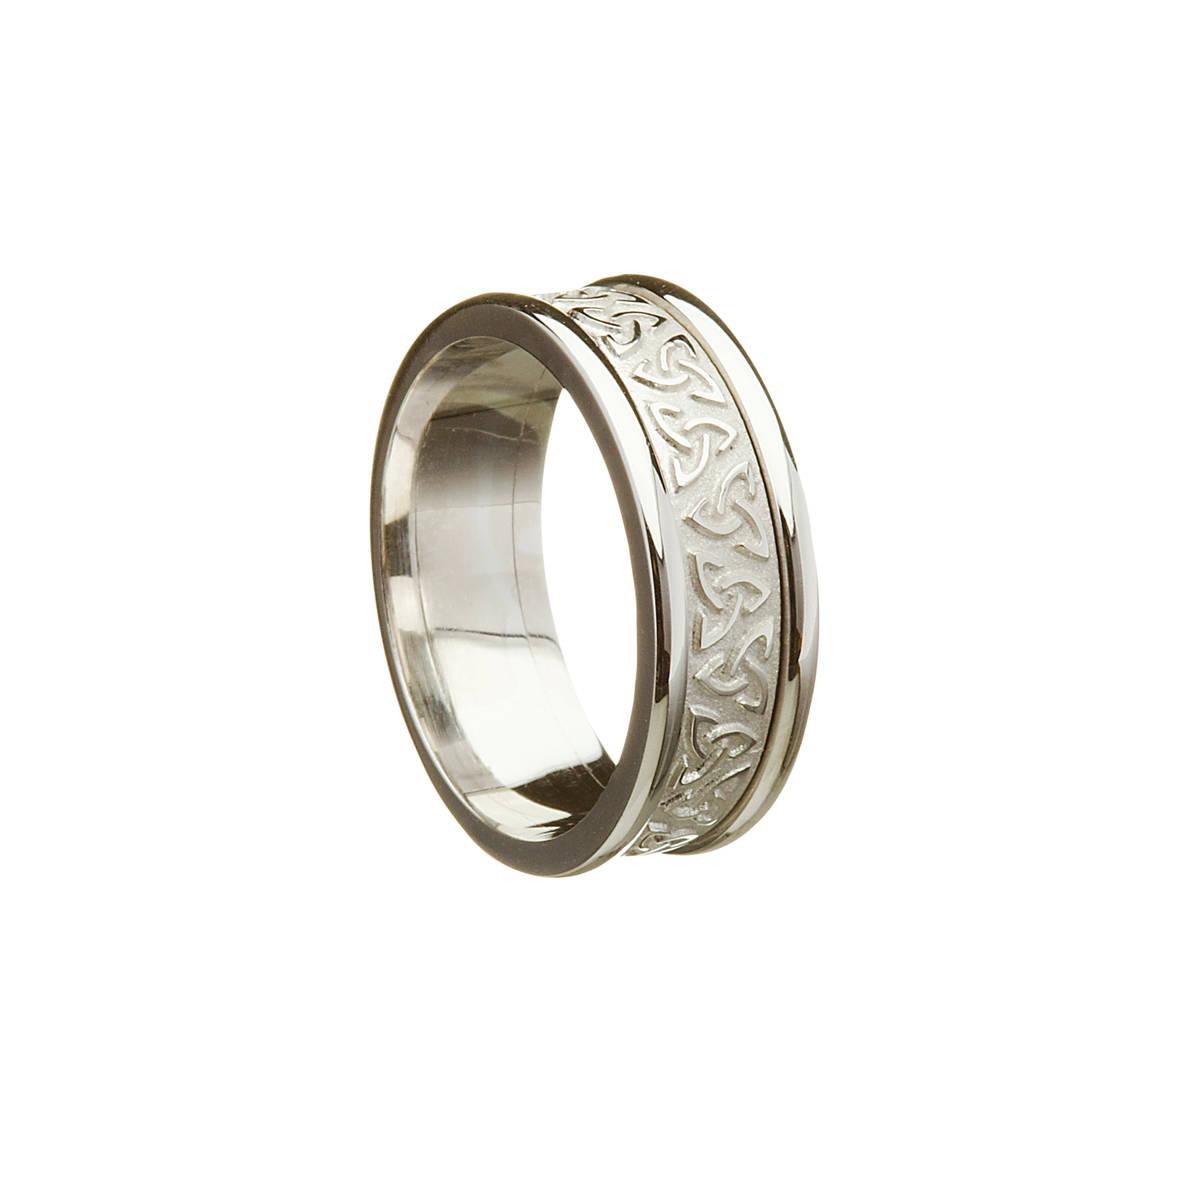 14 carat white gold raised trinity knot wedding band with heavy white rims